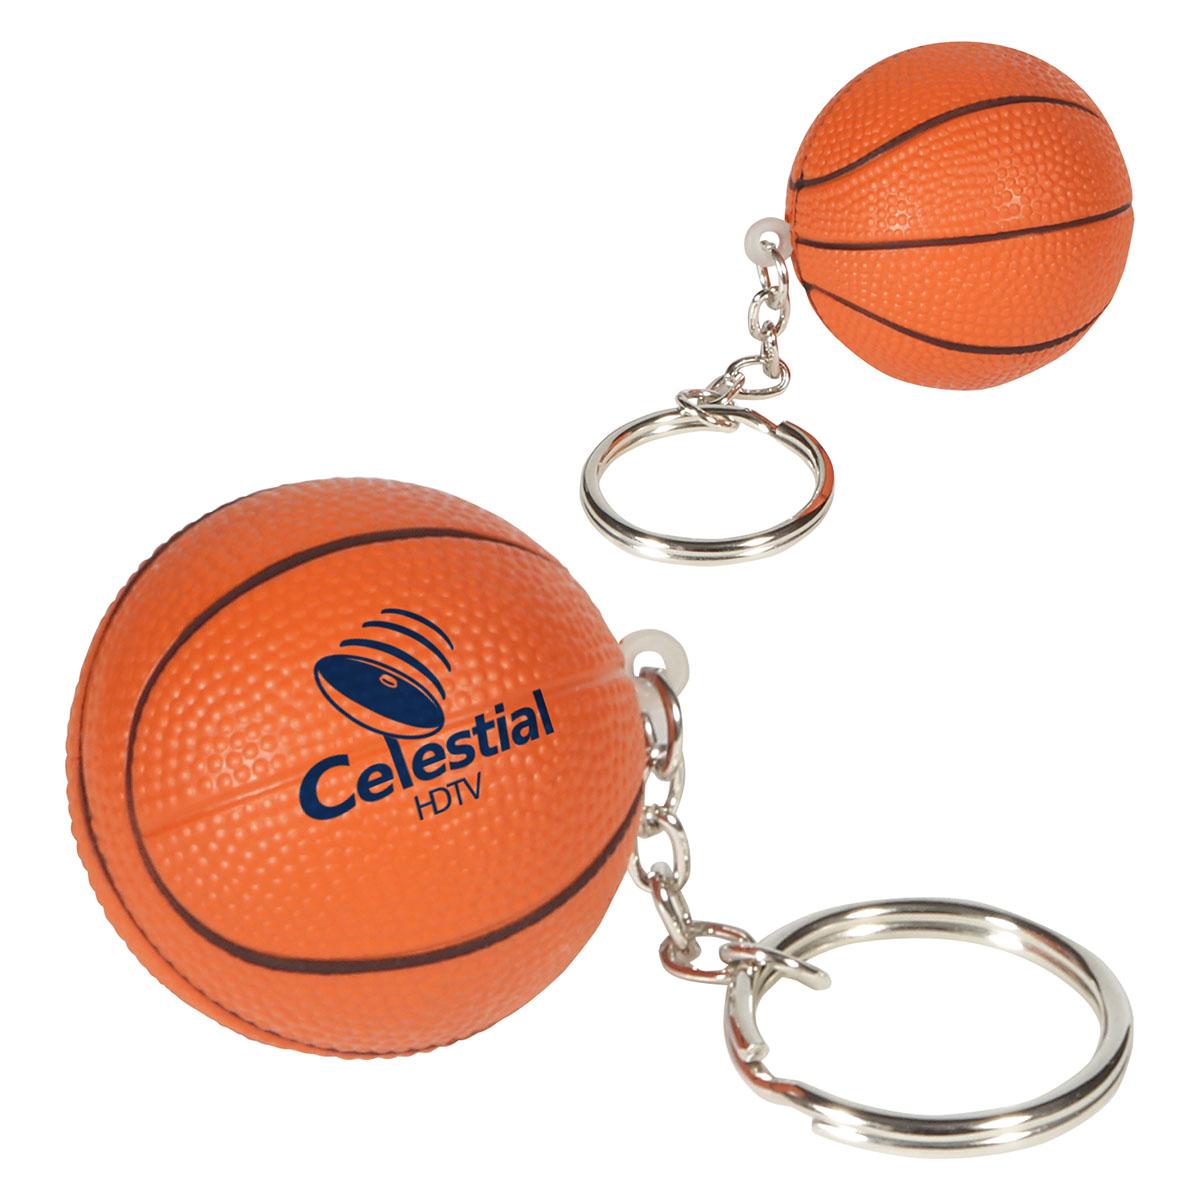 Basketball Stress Reliever Keychain, LKC-BK02 - 1 Colour Imprint